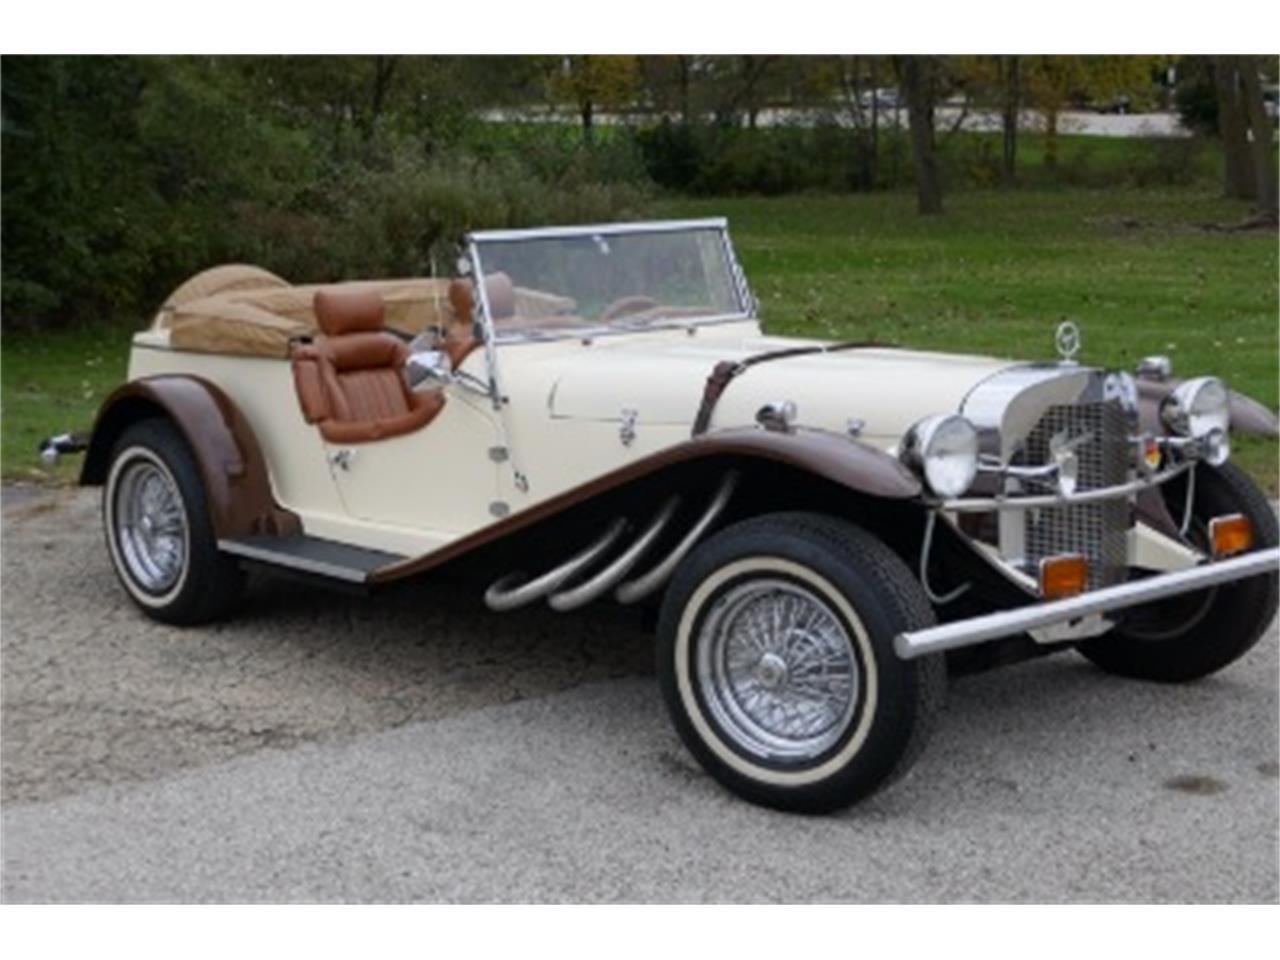 North Shore Classic Cars Mundelein Illinois